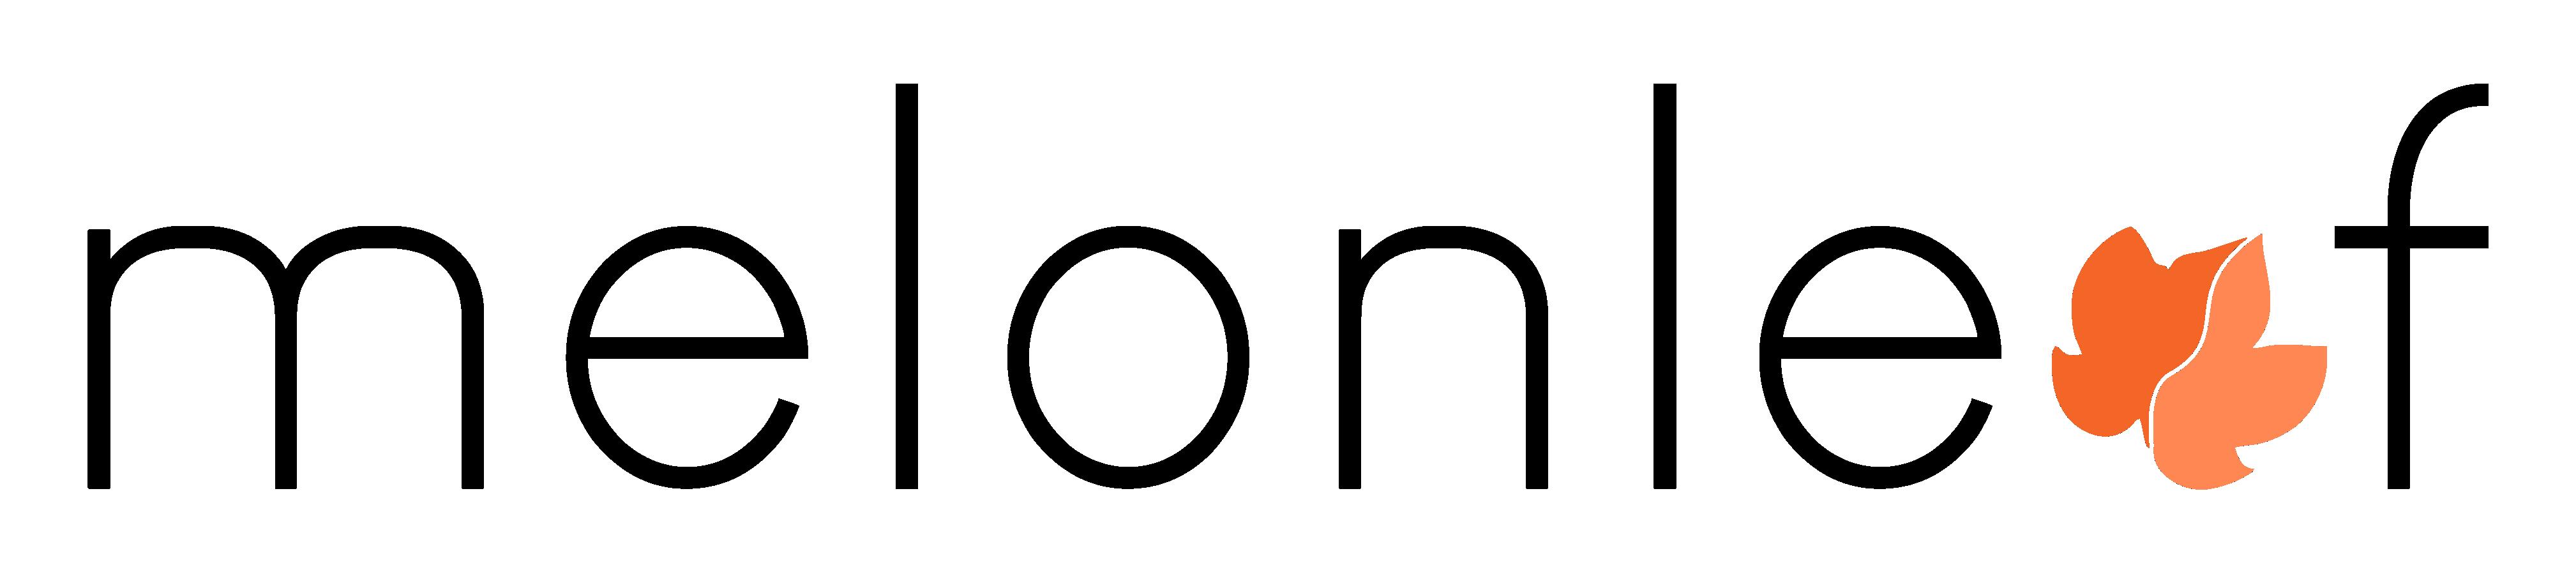 Melonleaf Consulting Logo